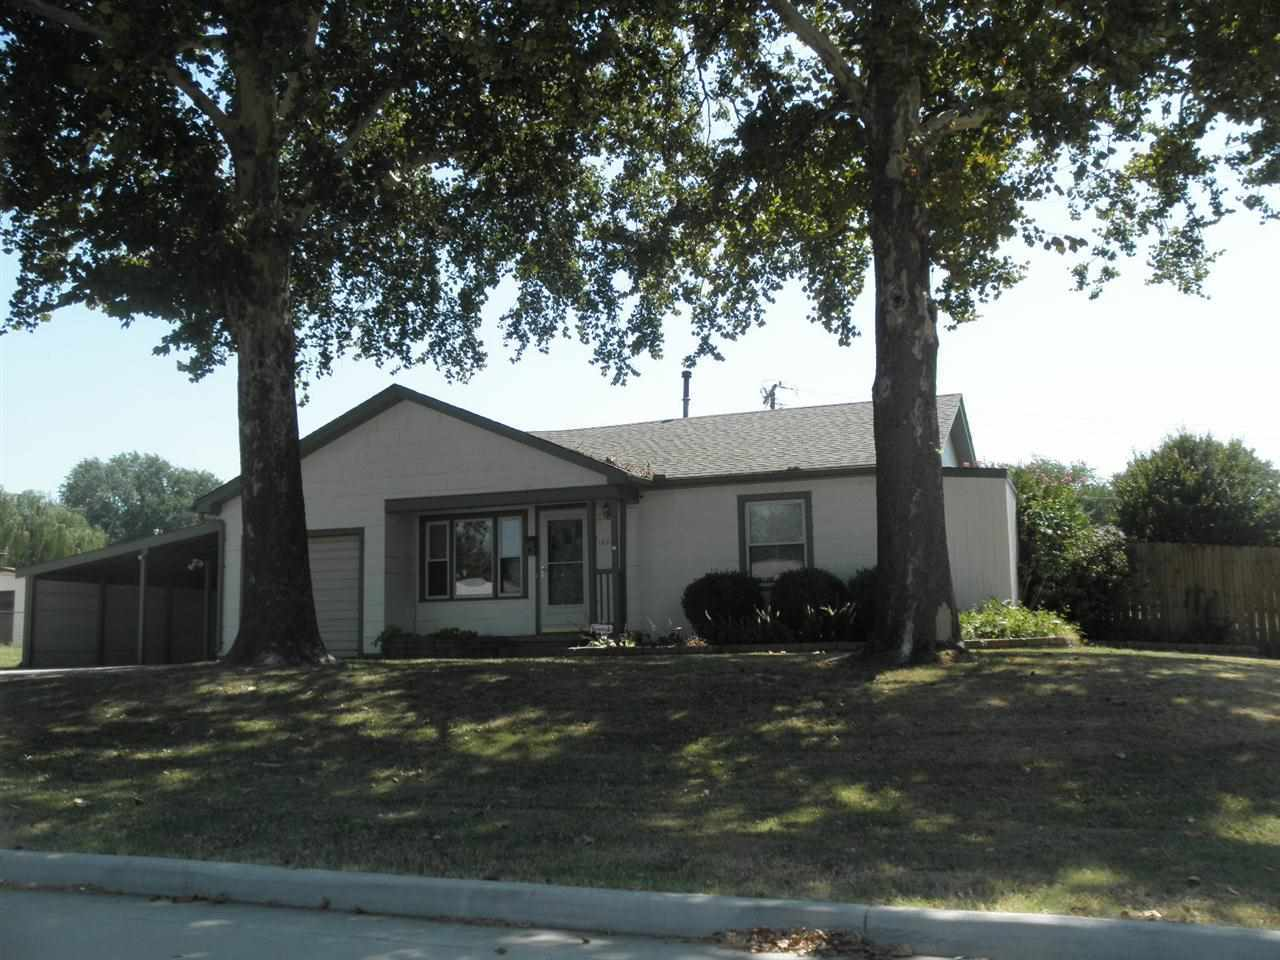 Sold Cross Sale W/ MLS | 1625 Donahoe  Ponca City, OK 74601 0